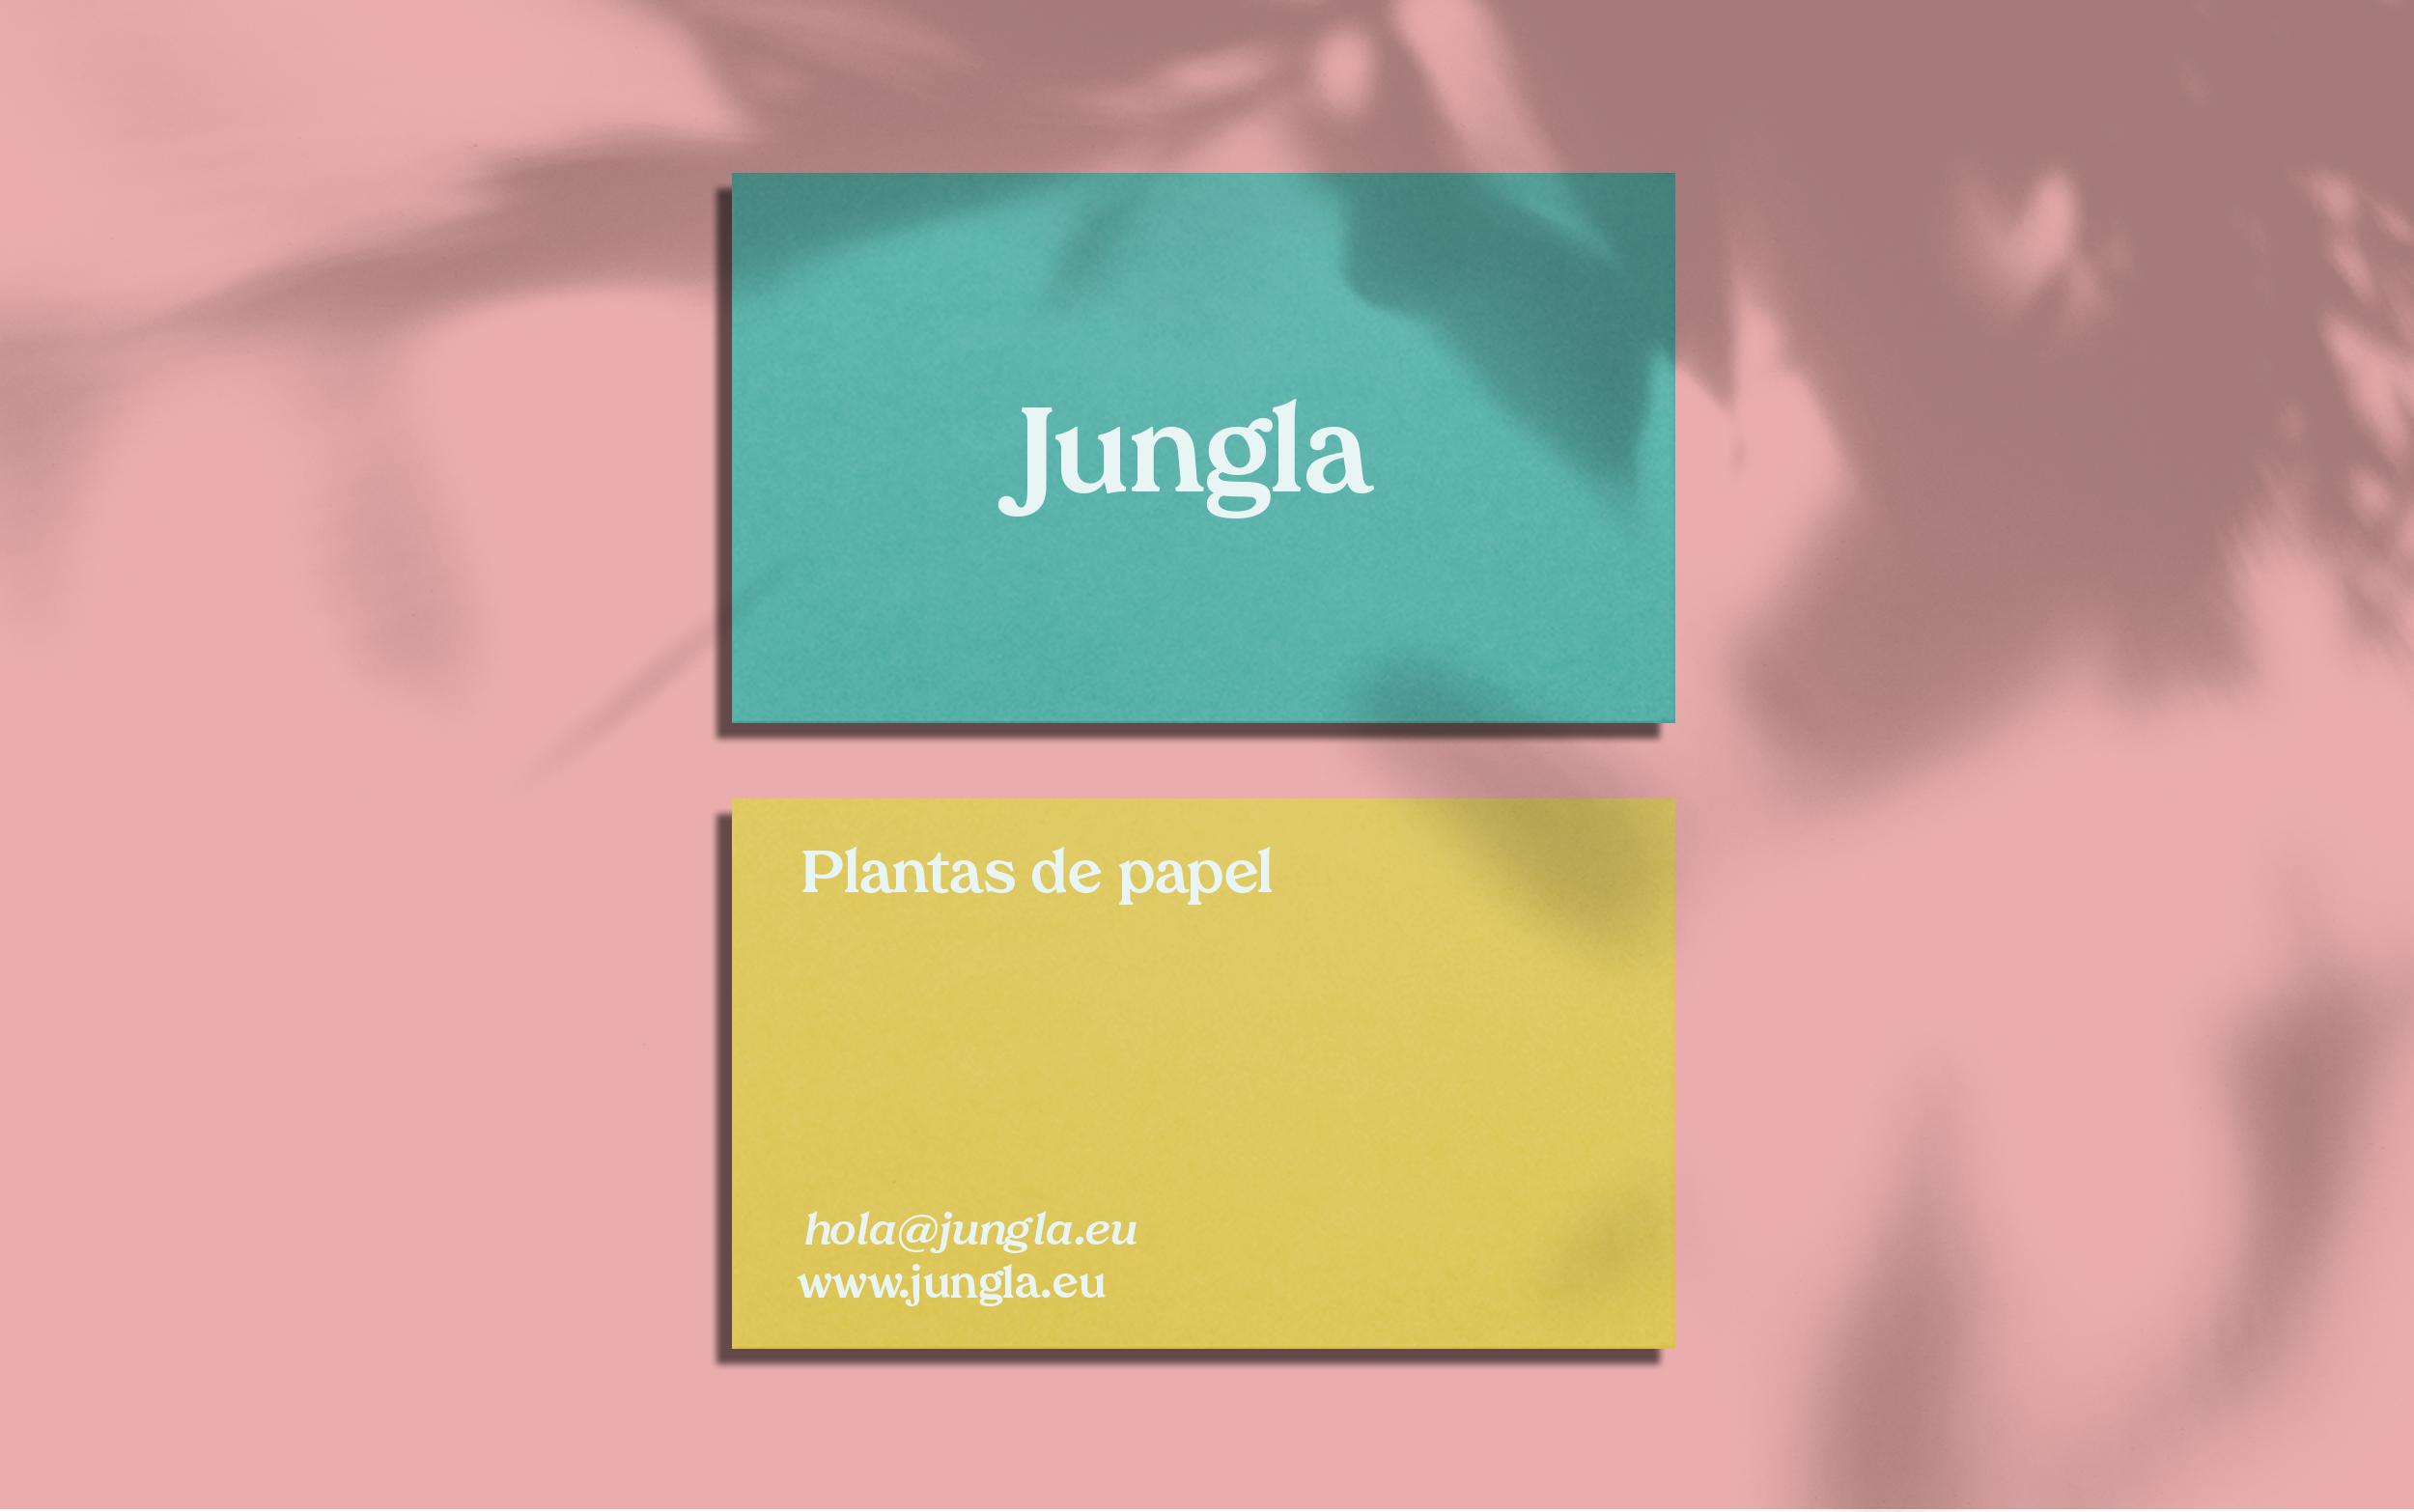 Diseño e identidad de marca Jungla.